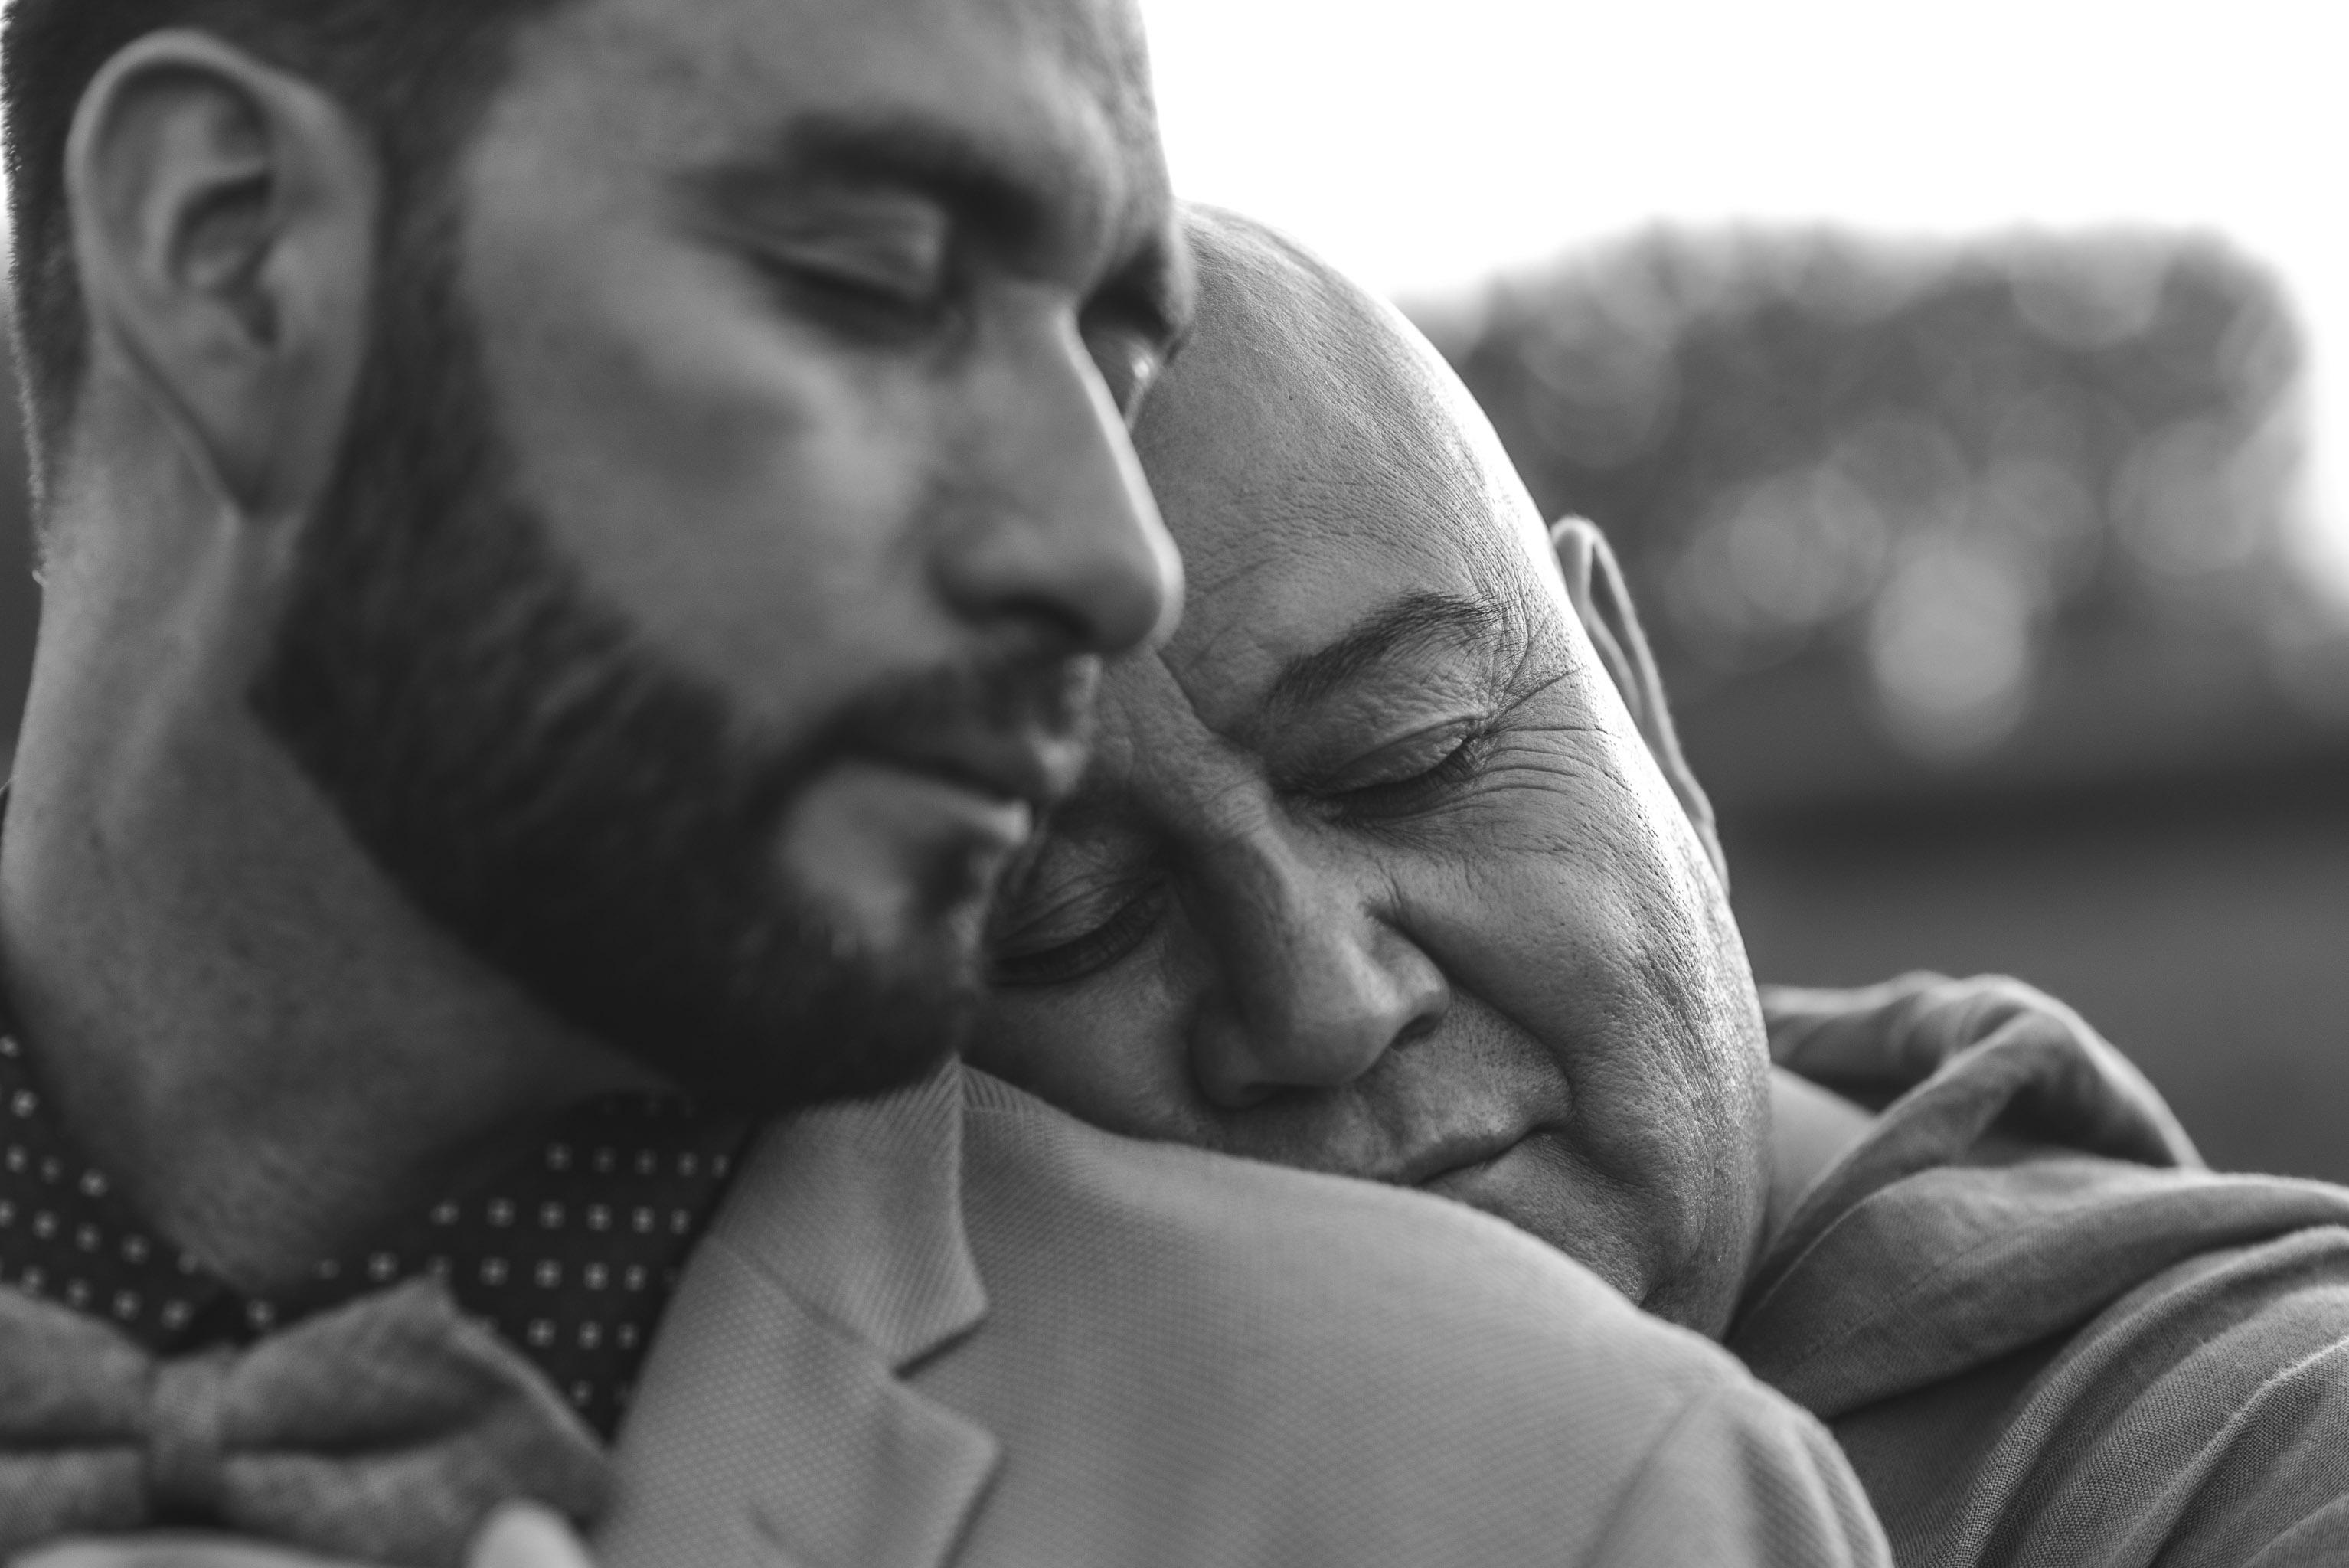 union civil-matrimonio igualitario-matrimonio gay-fotografo de matrimonios